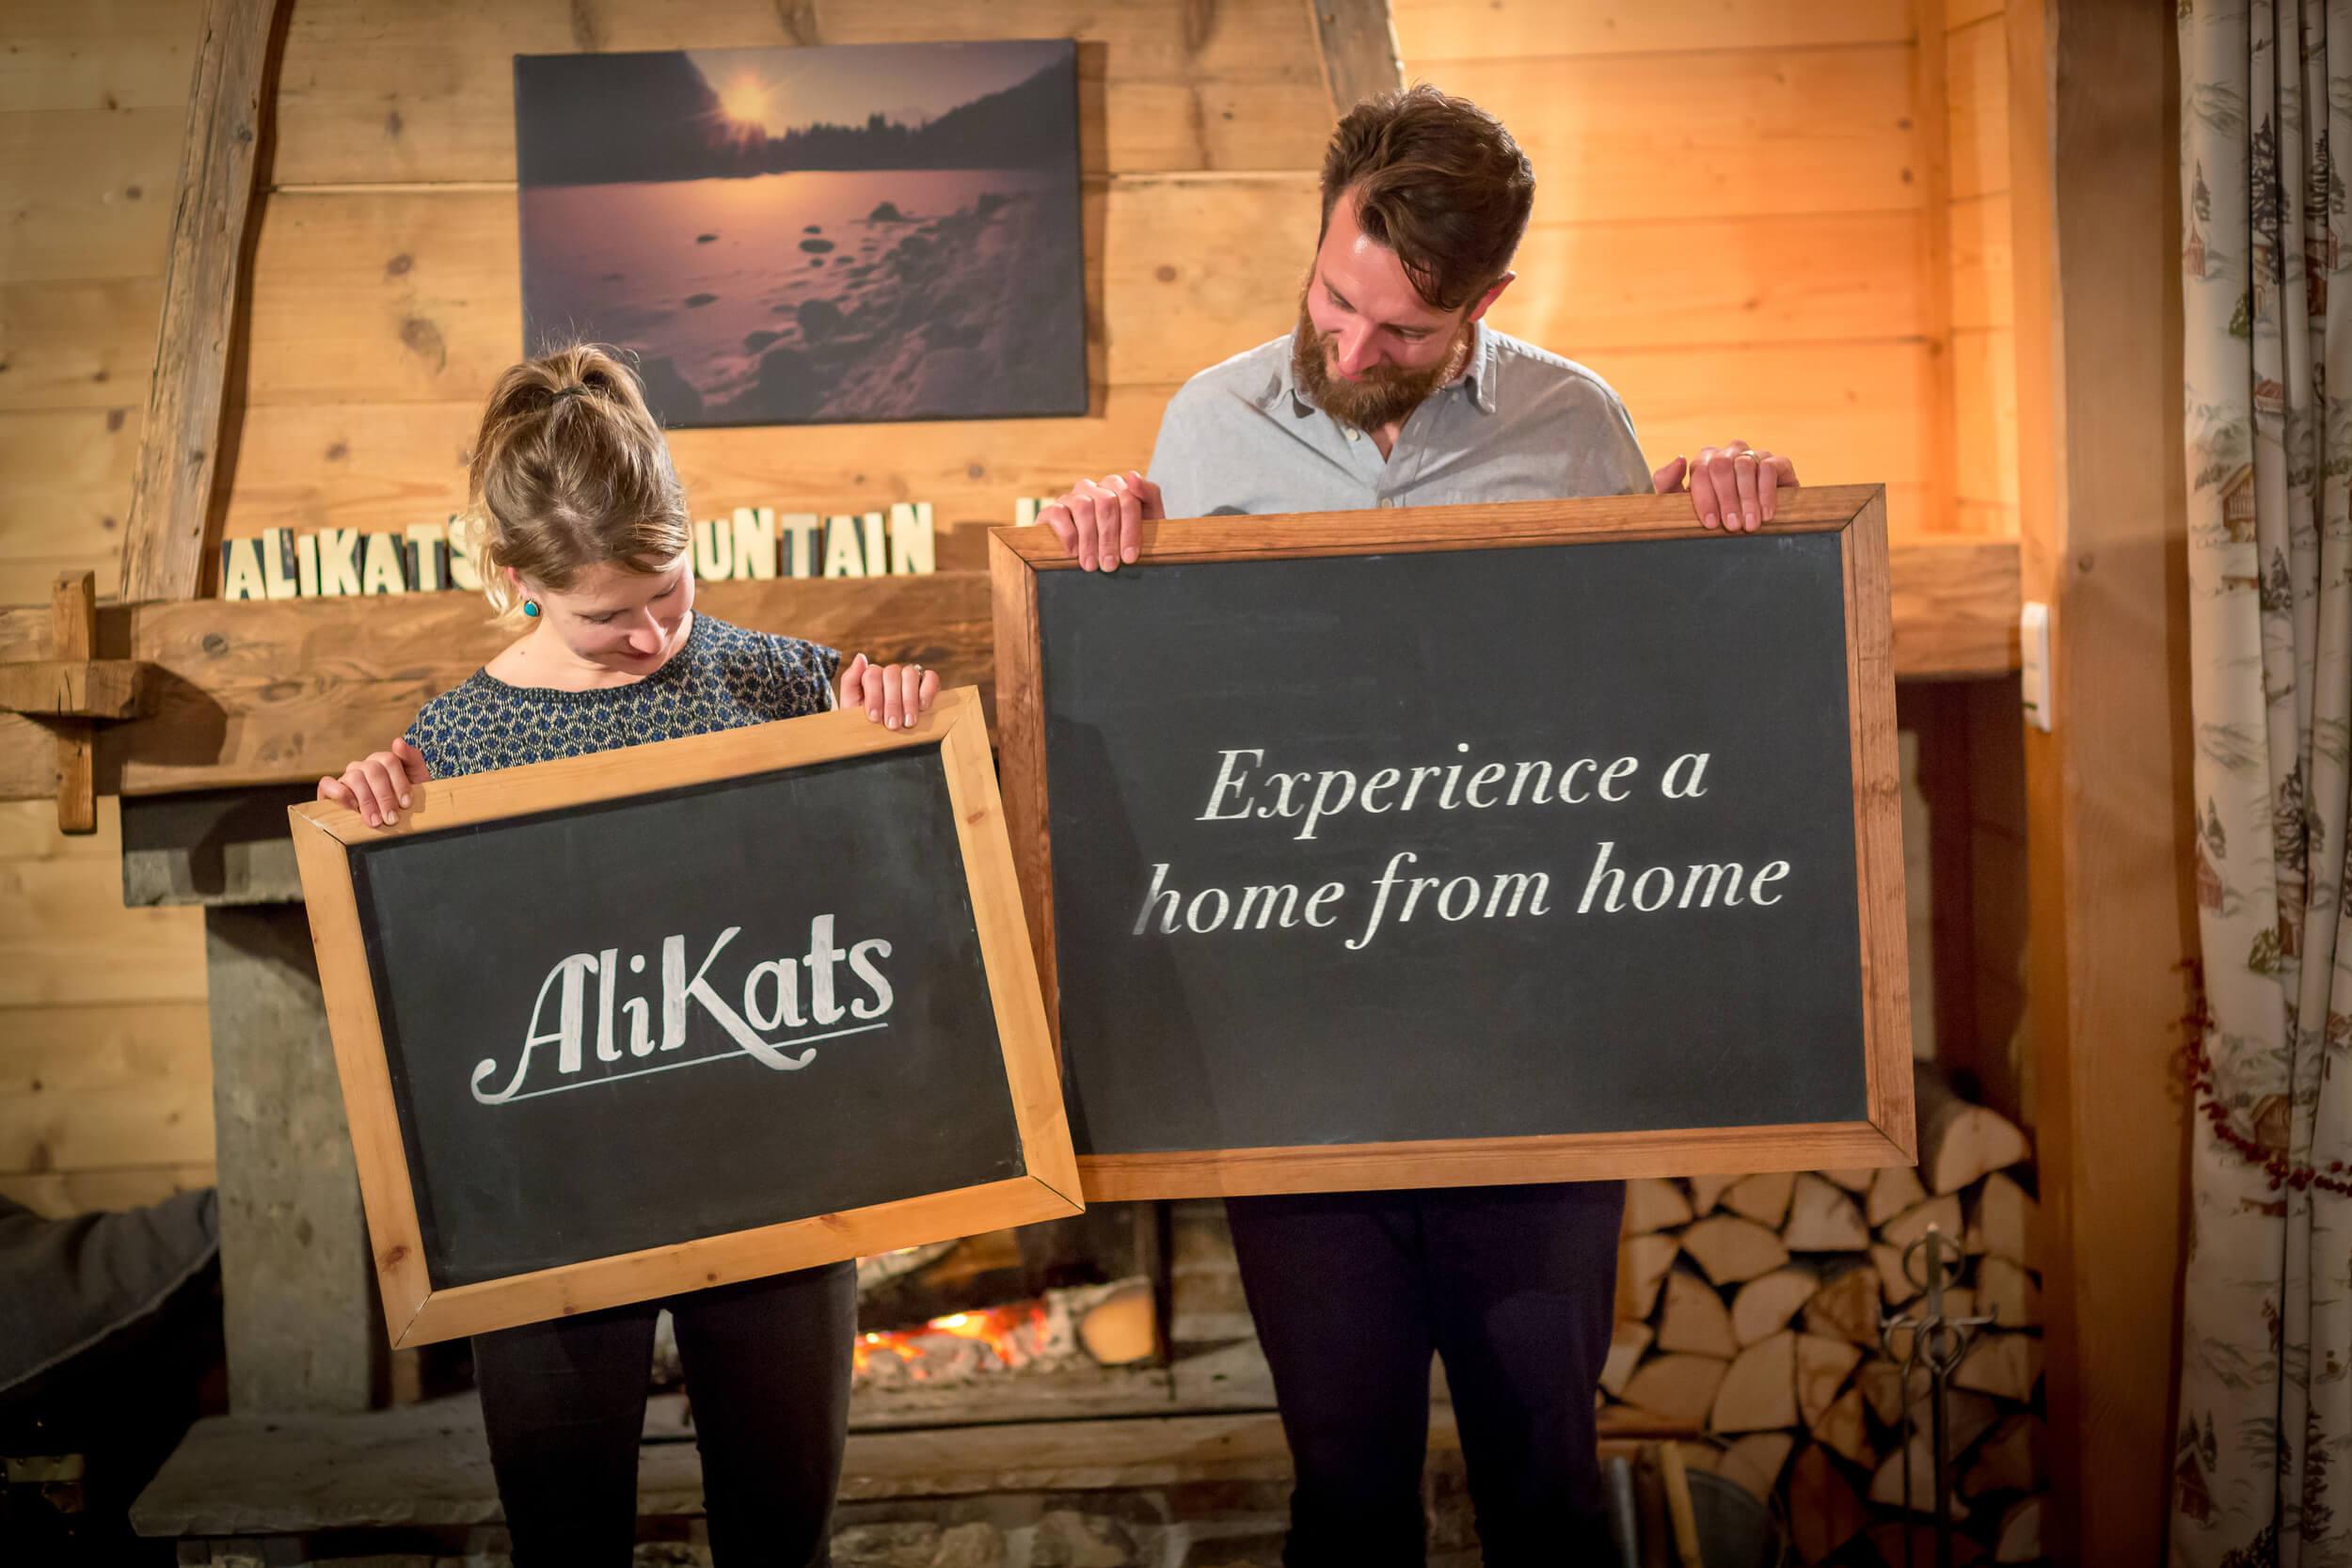 Al & Kat from AliKats!